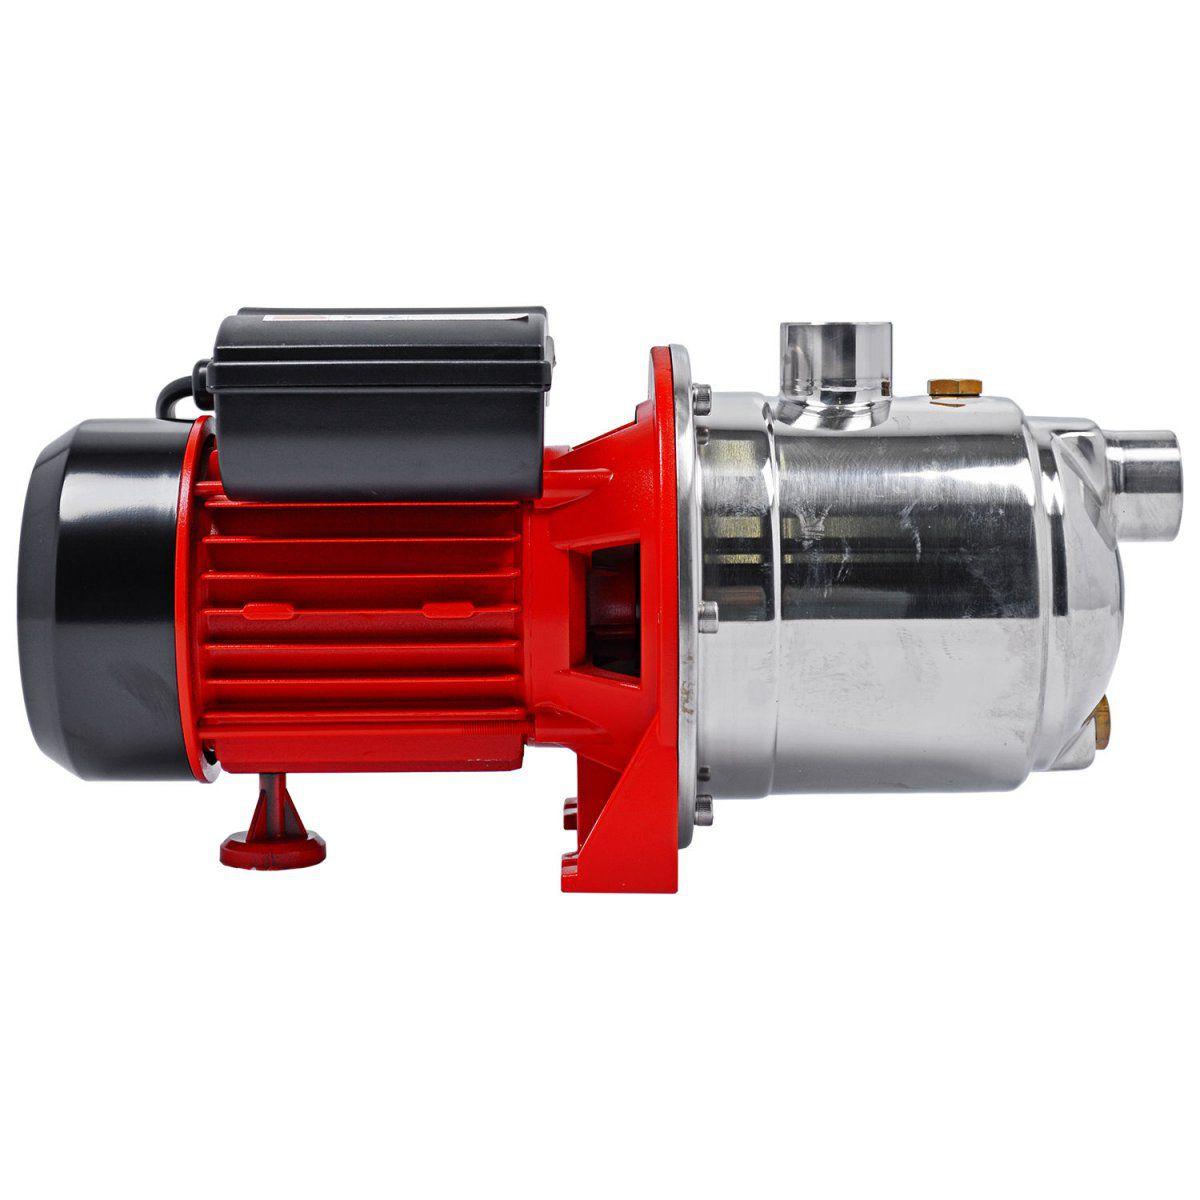 Motobomba Elétrica Autoaspirante 1/2CV Worker